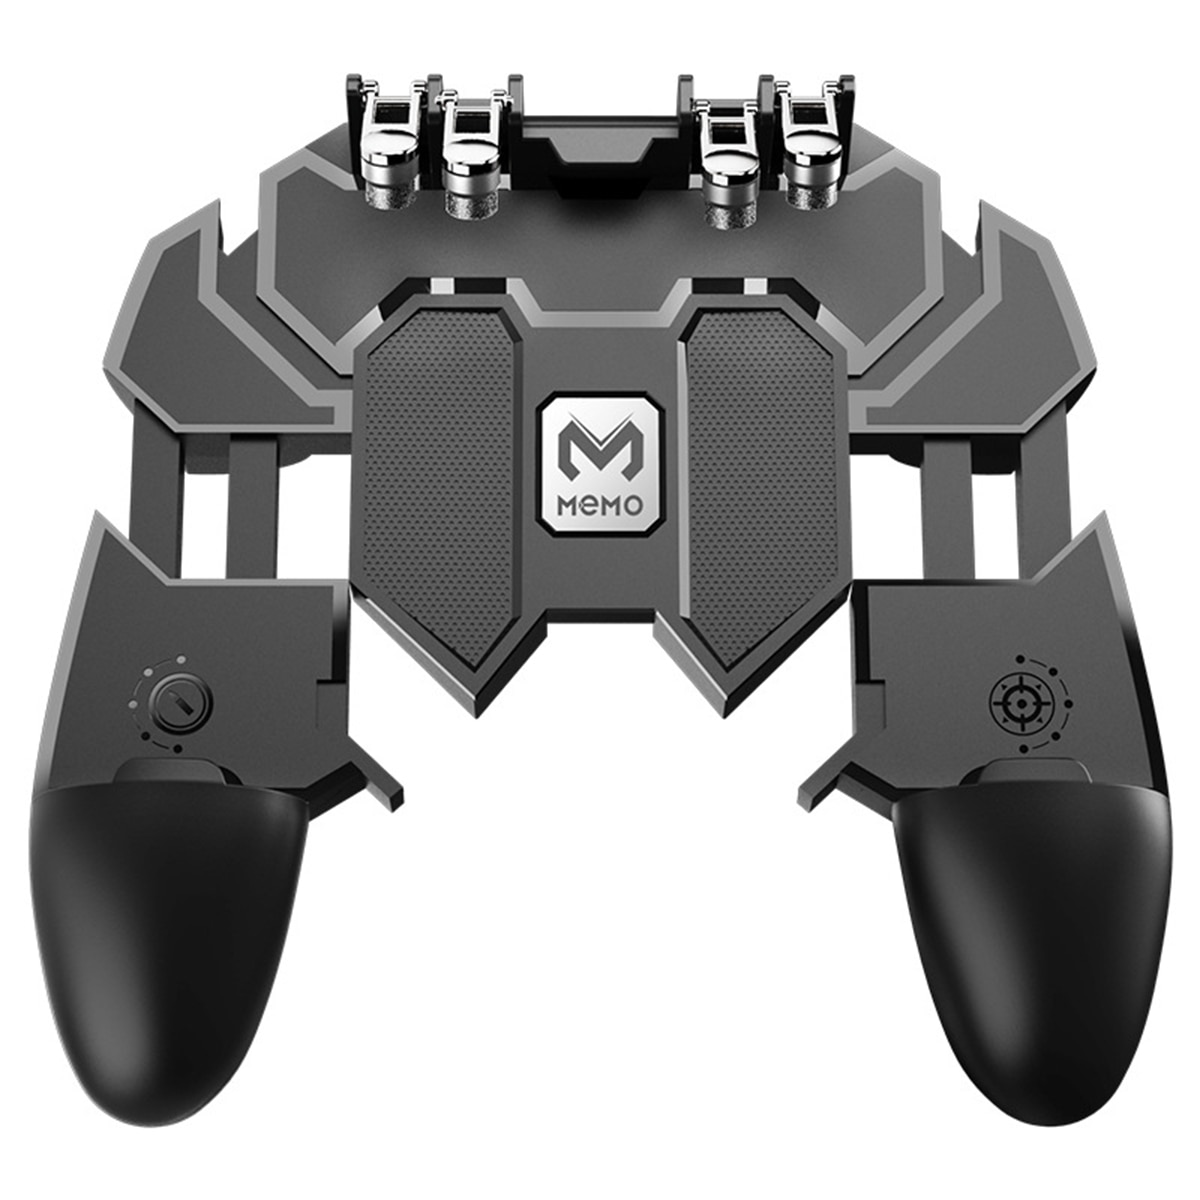 Mando de Gaming con Joystick para teléfono móvil, mando de Gamepad portátil, mando Reversible para juego PUBG